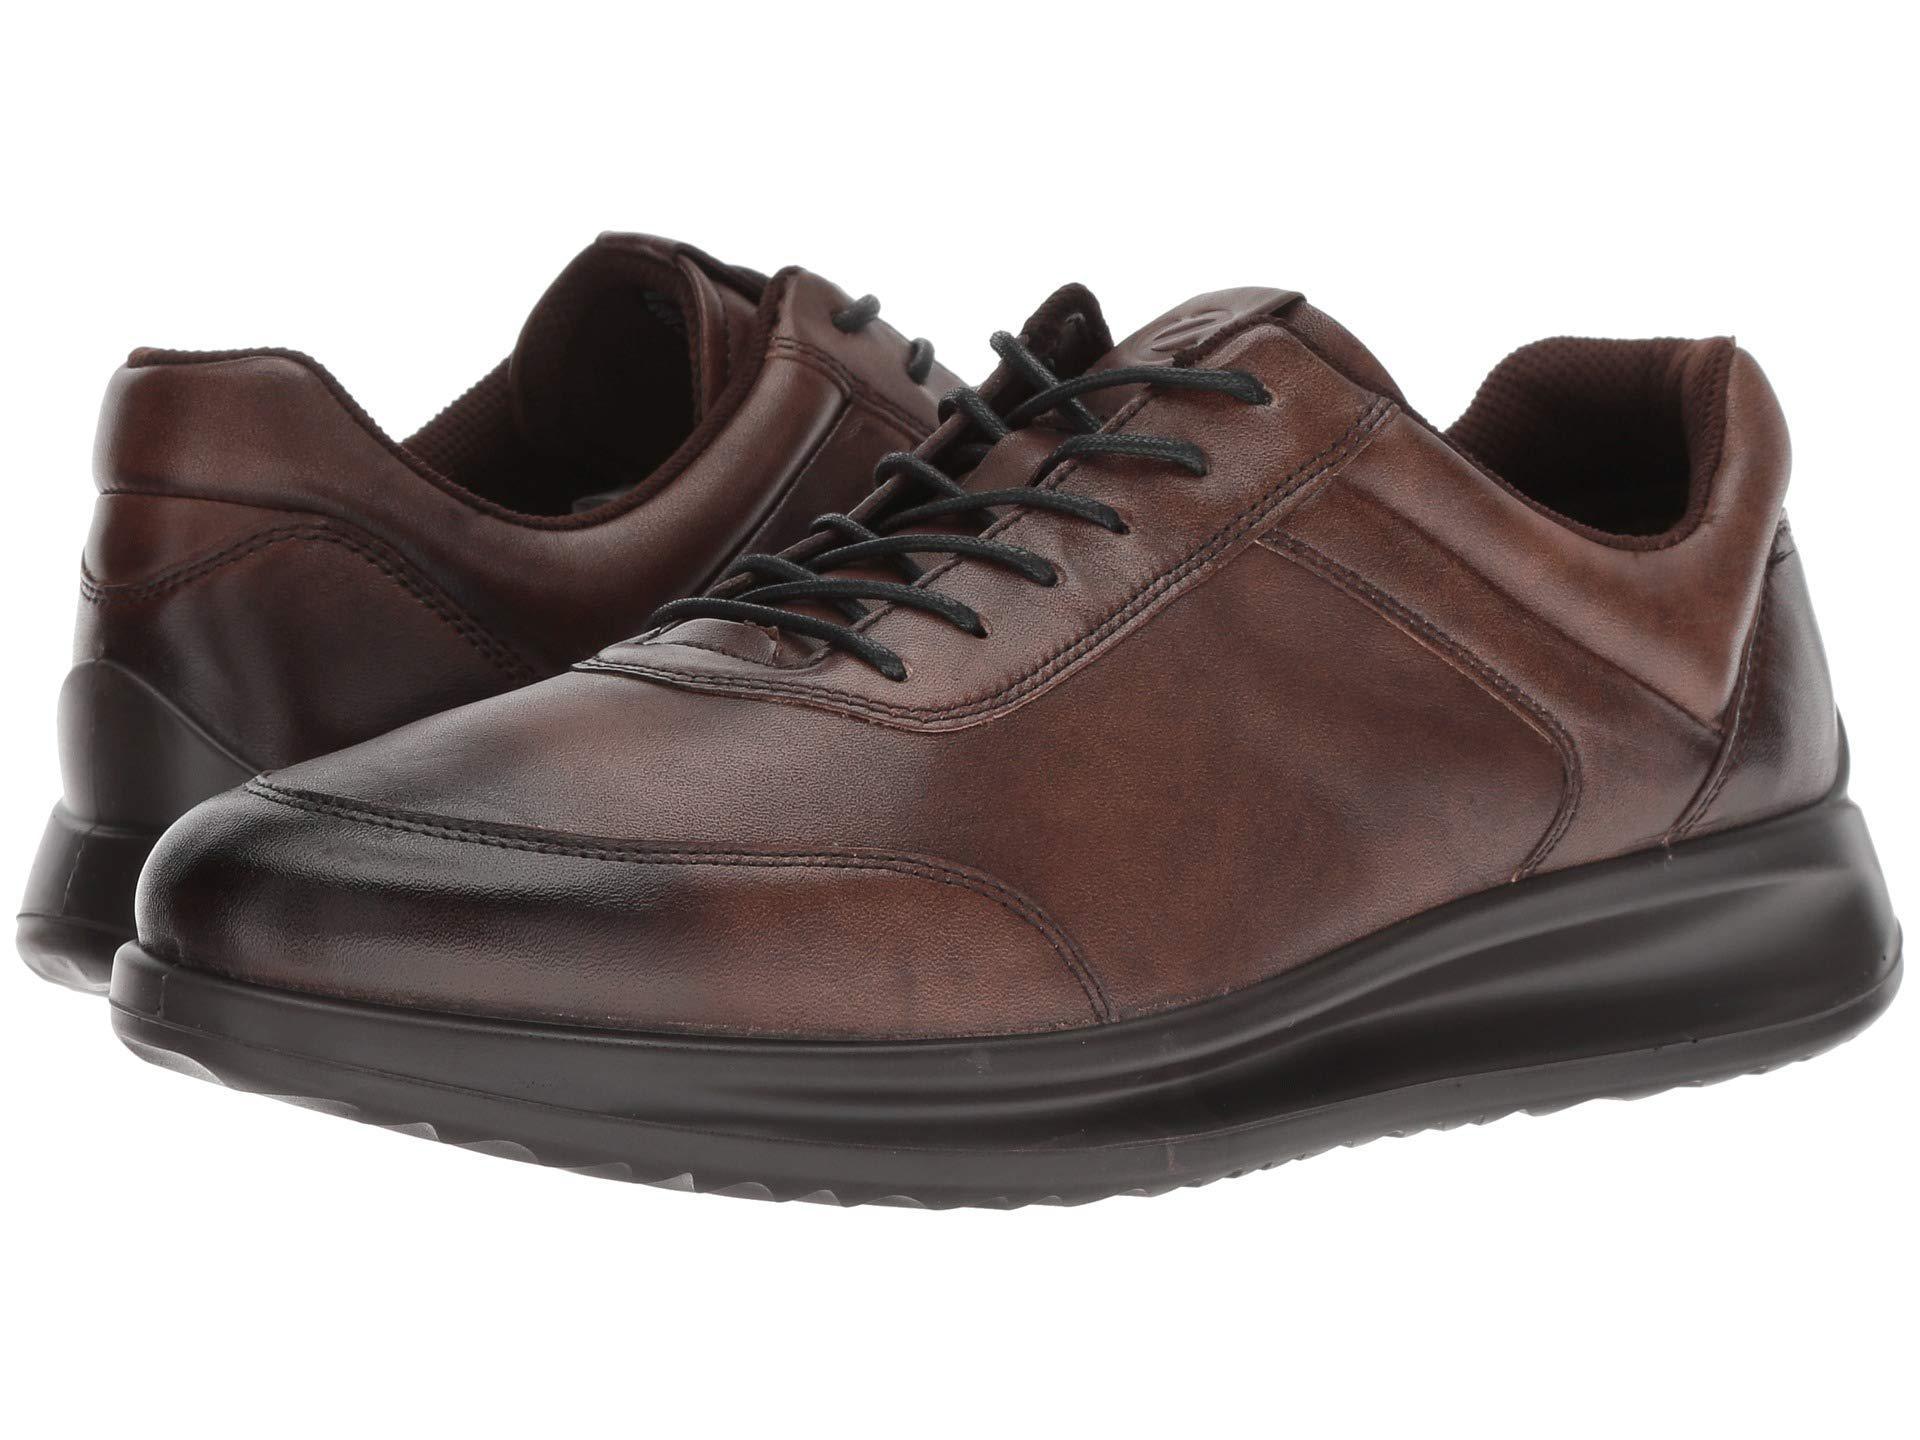 e77aae4b7a5 Ecco Aquet Sneaker (cocoa Brown) Men's Shoes in Brown for Men - Lyst